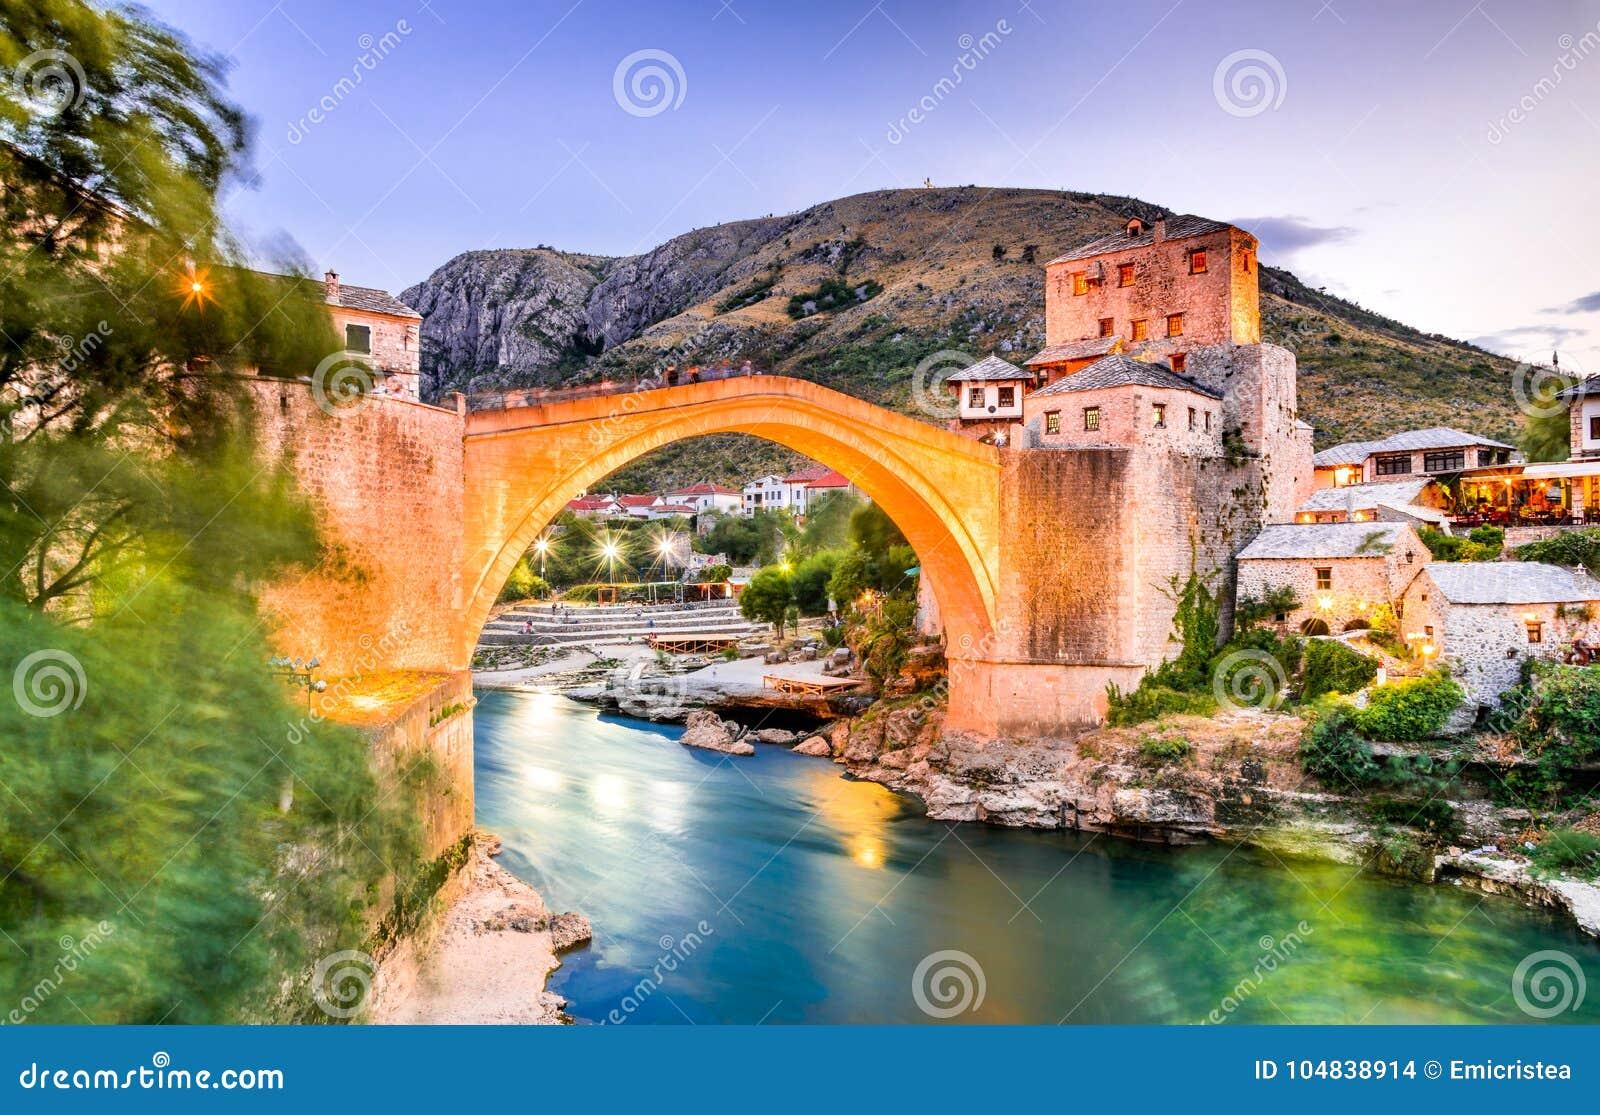 Mostar, Stari Most bridge in Bosnia and Herzegovina